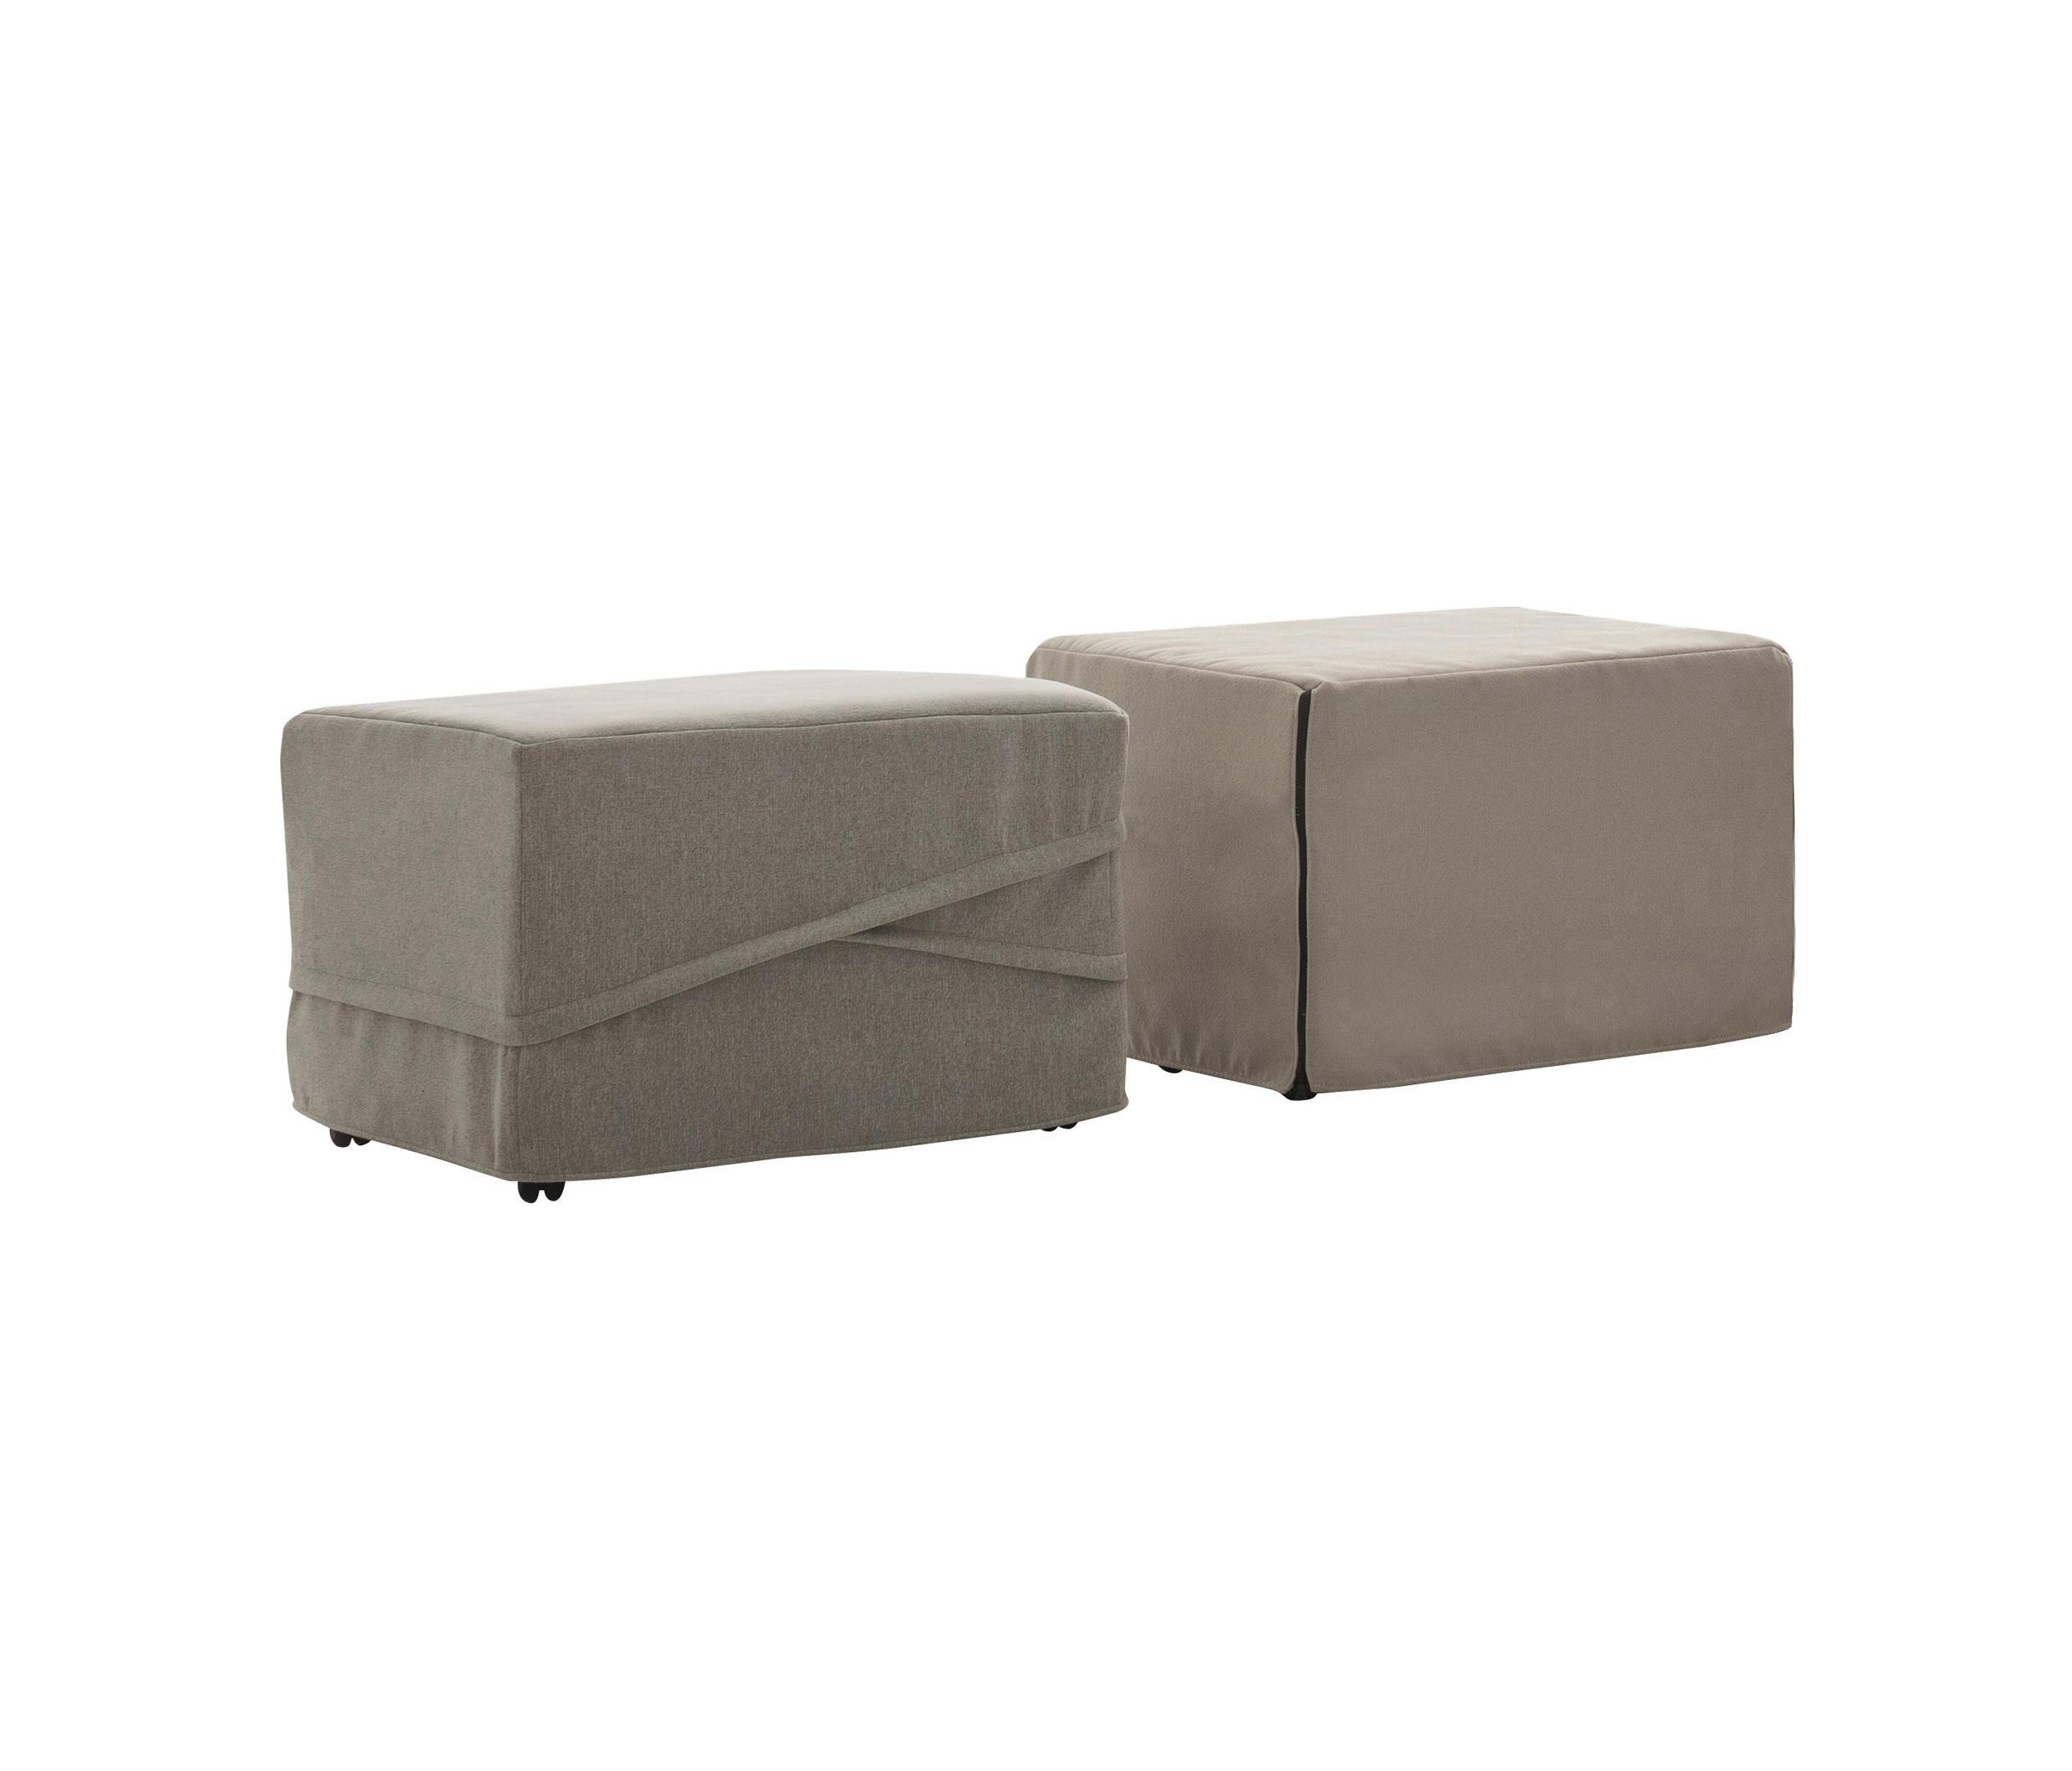 Phenomenal Pouff Beds From Ditre Italia Architonic Creativecarmelina Interior Chair Design Creativecarmelinacom